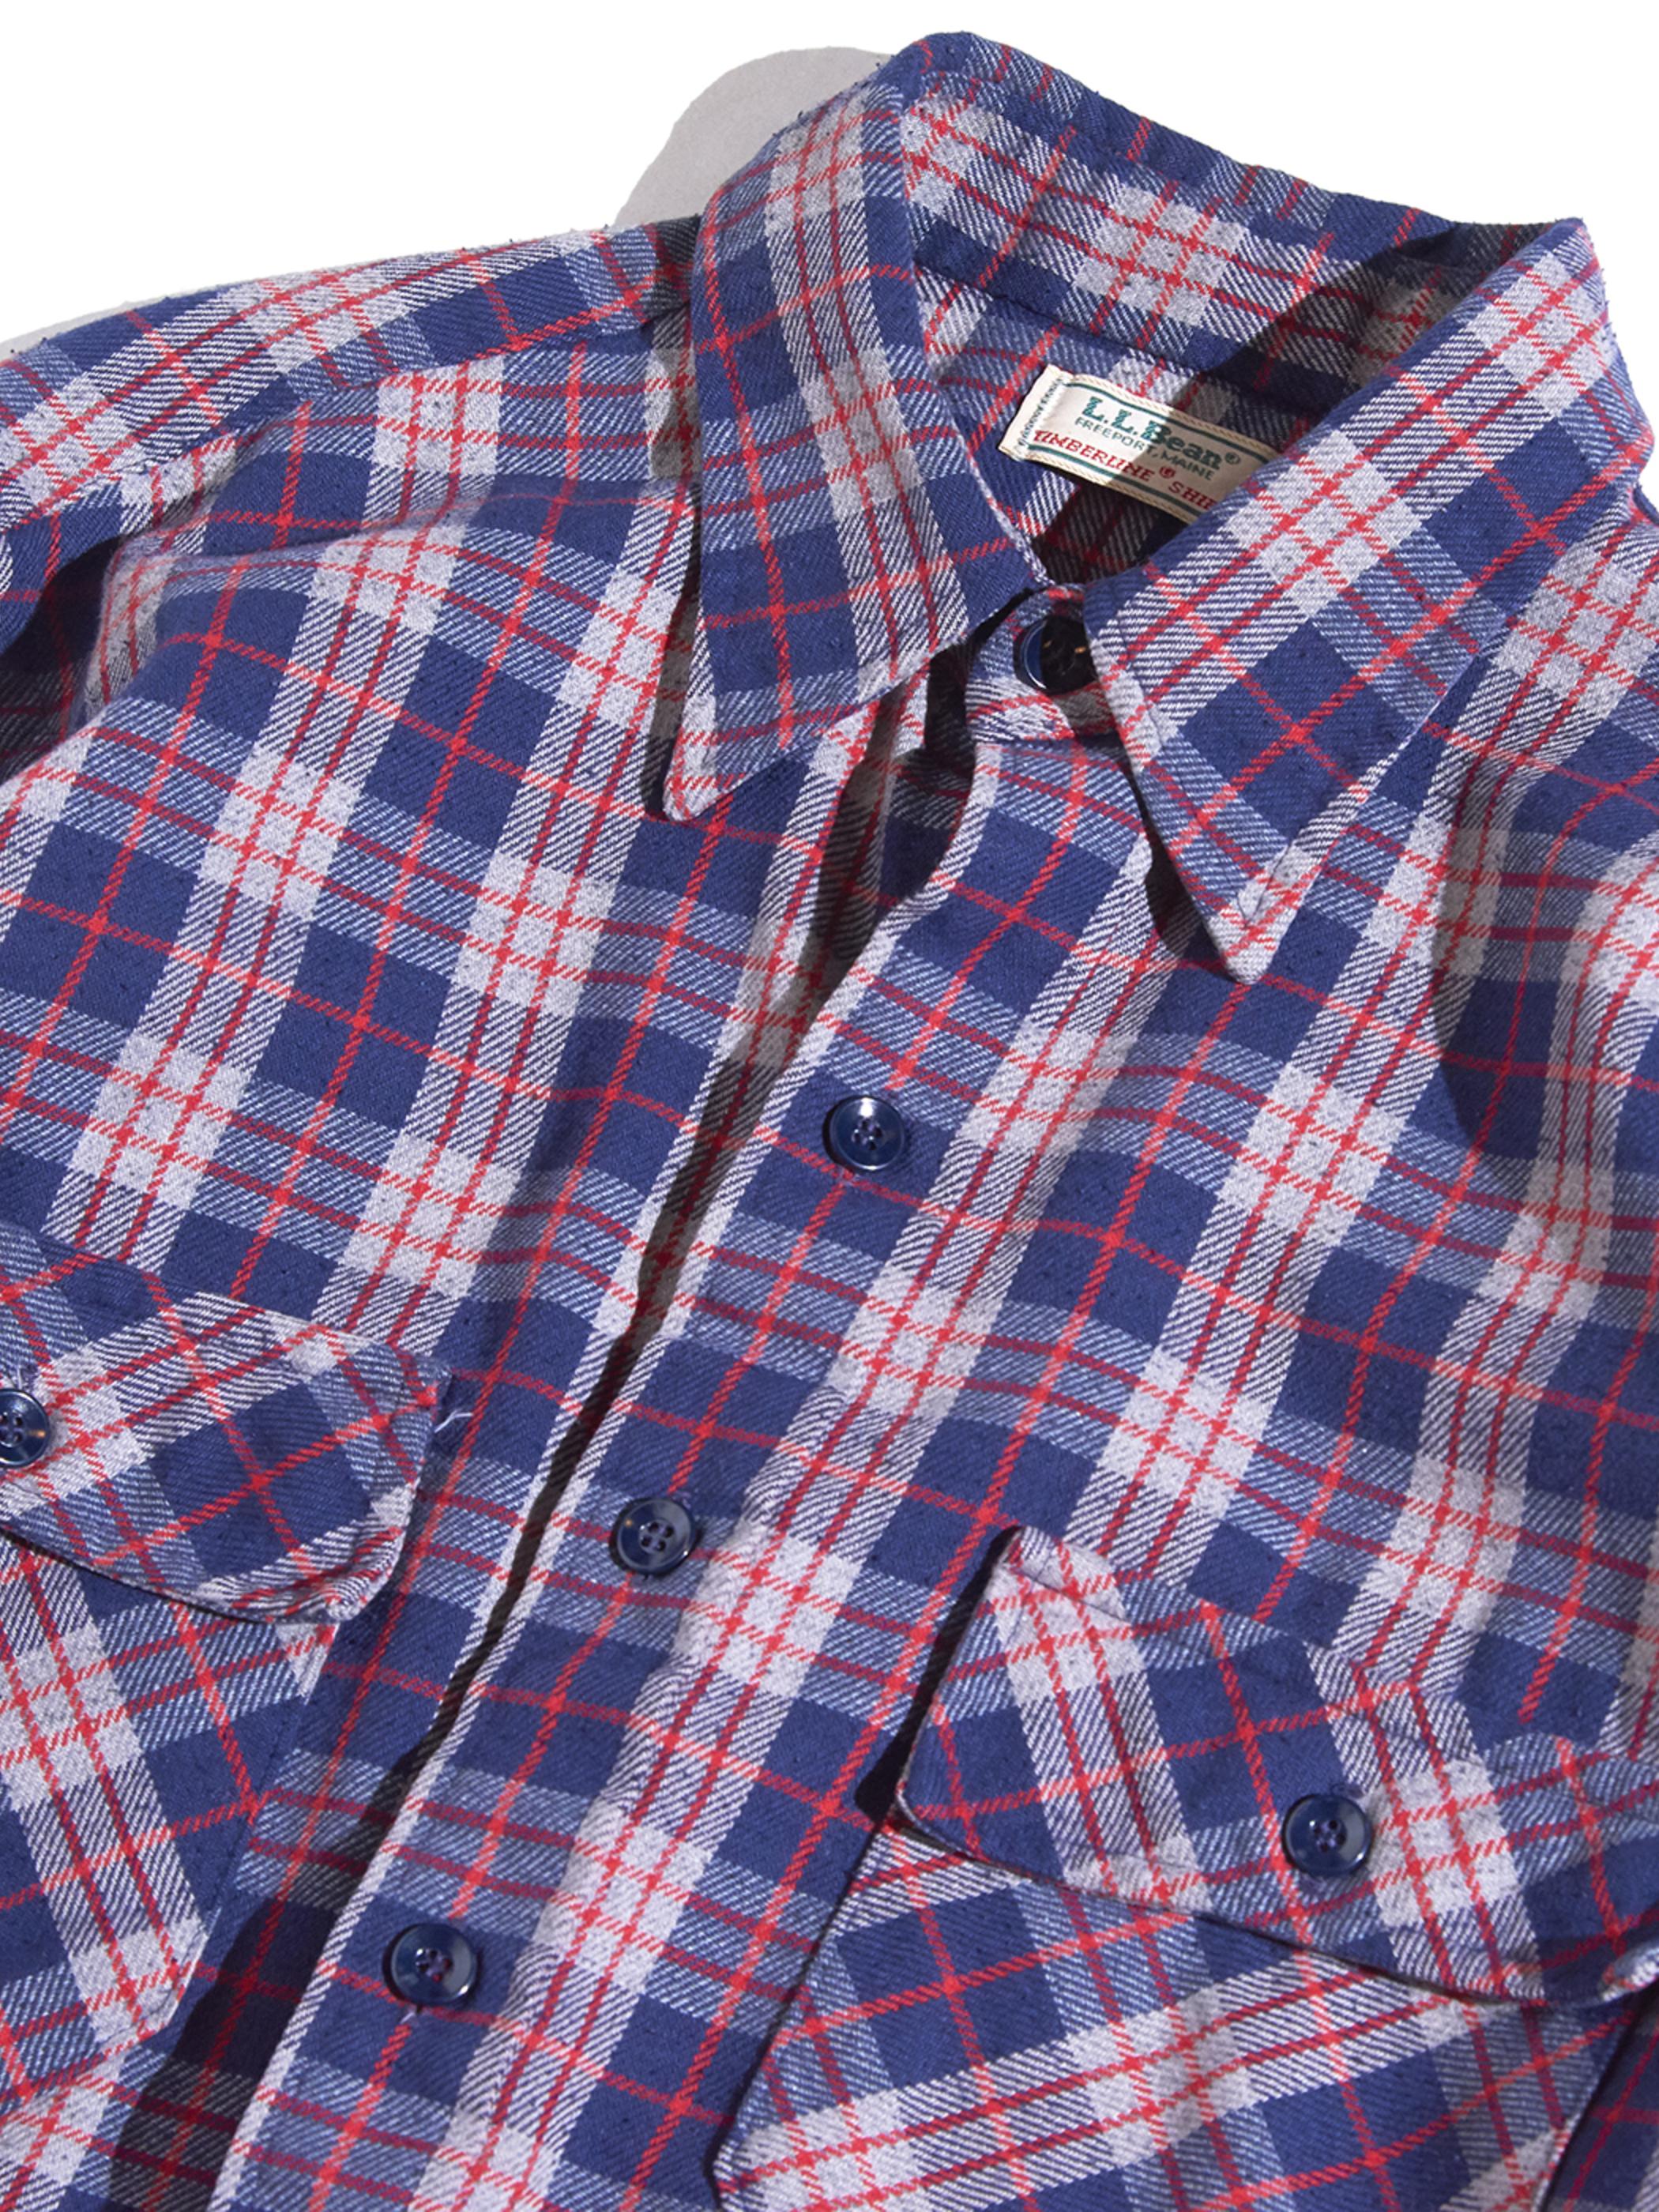 "1980s ""L.L.Bean"" TIMBERLINE®️ SHIRT cotton flannel shirt -CHECK-"